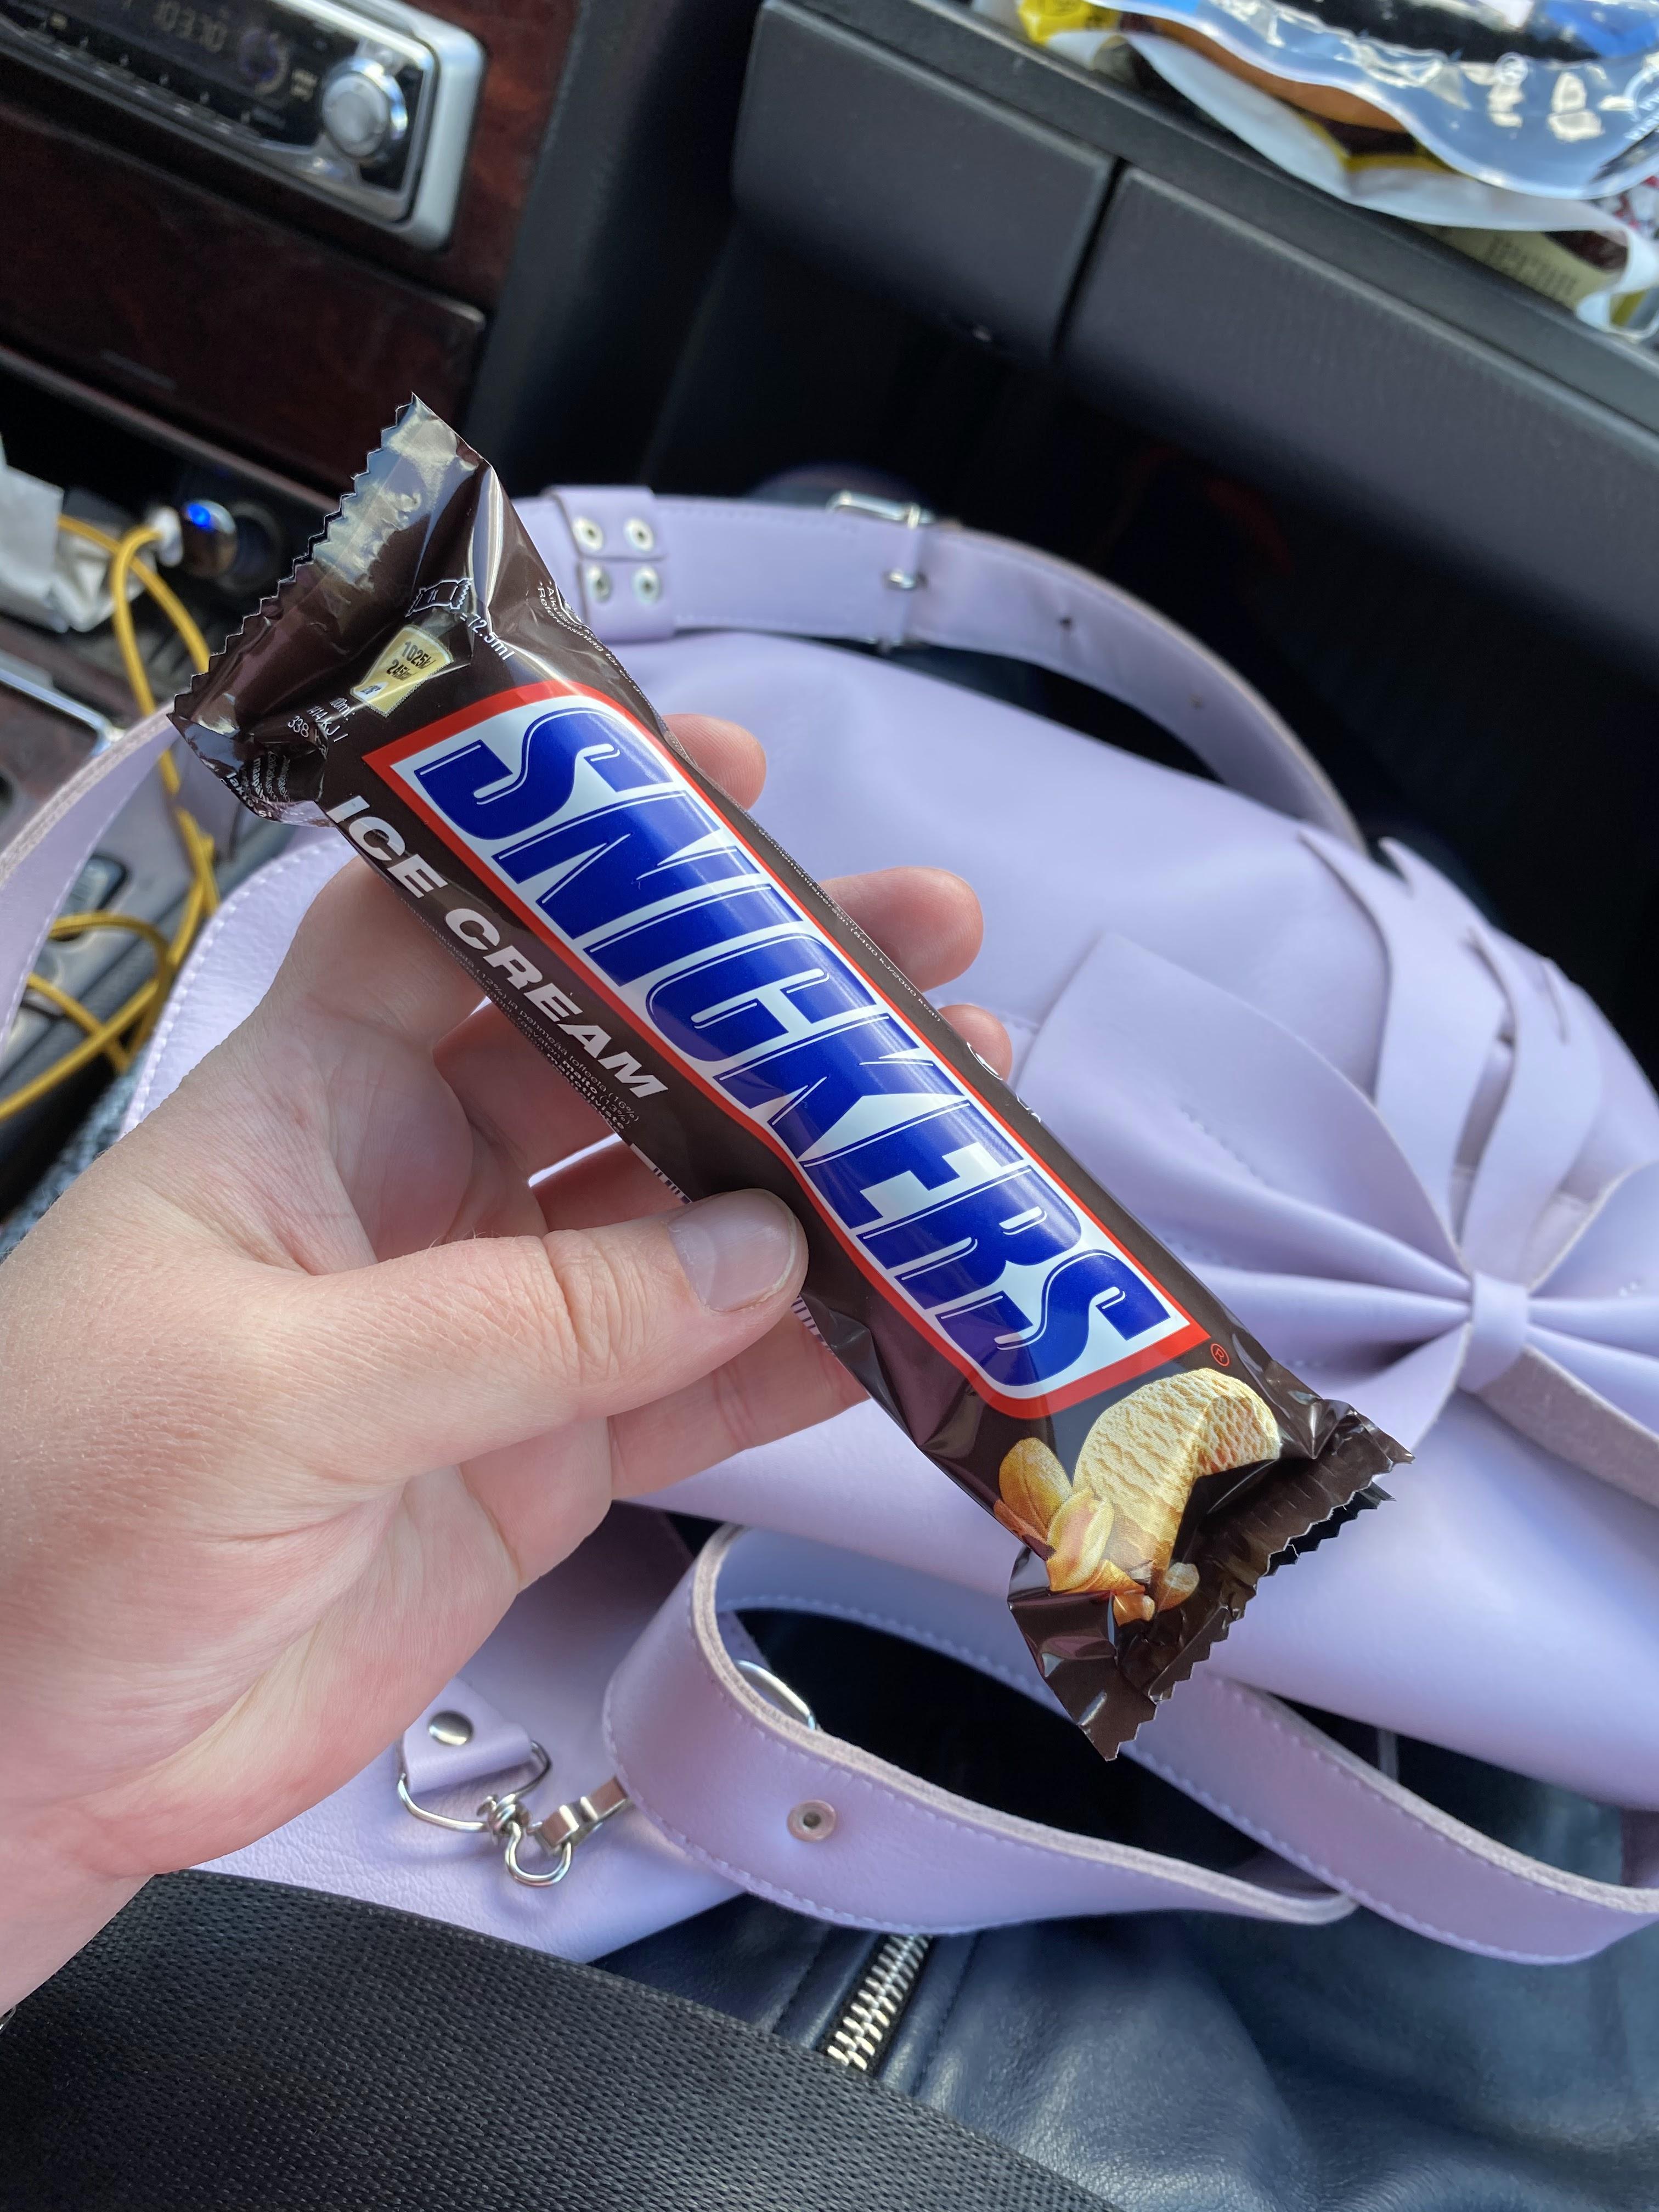 Snickers jaatelo